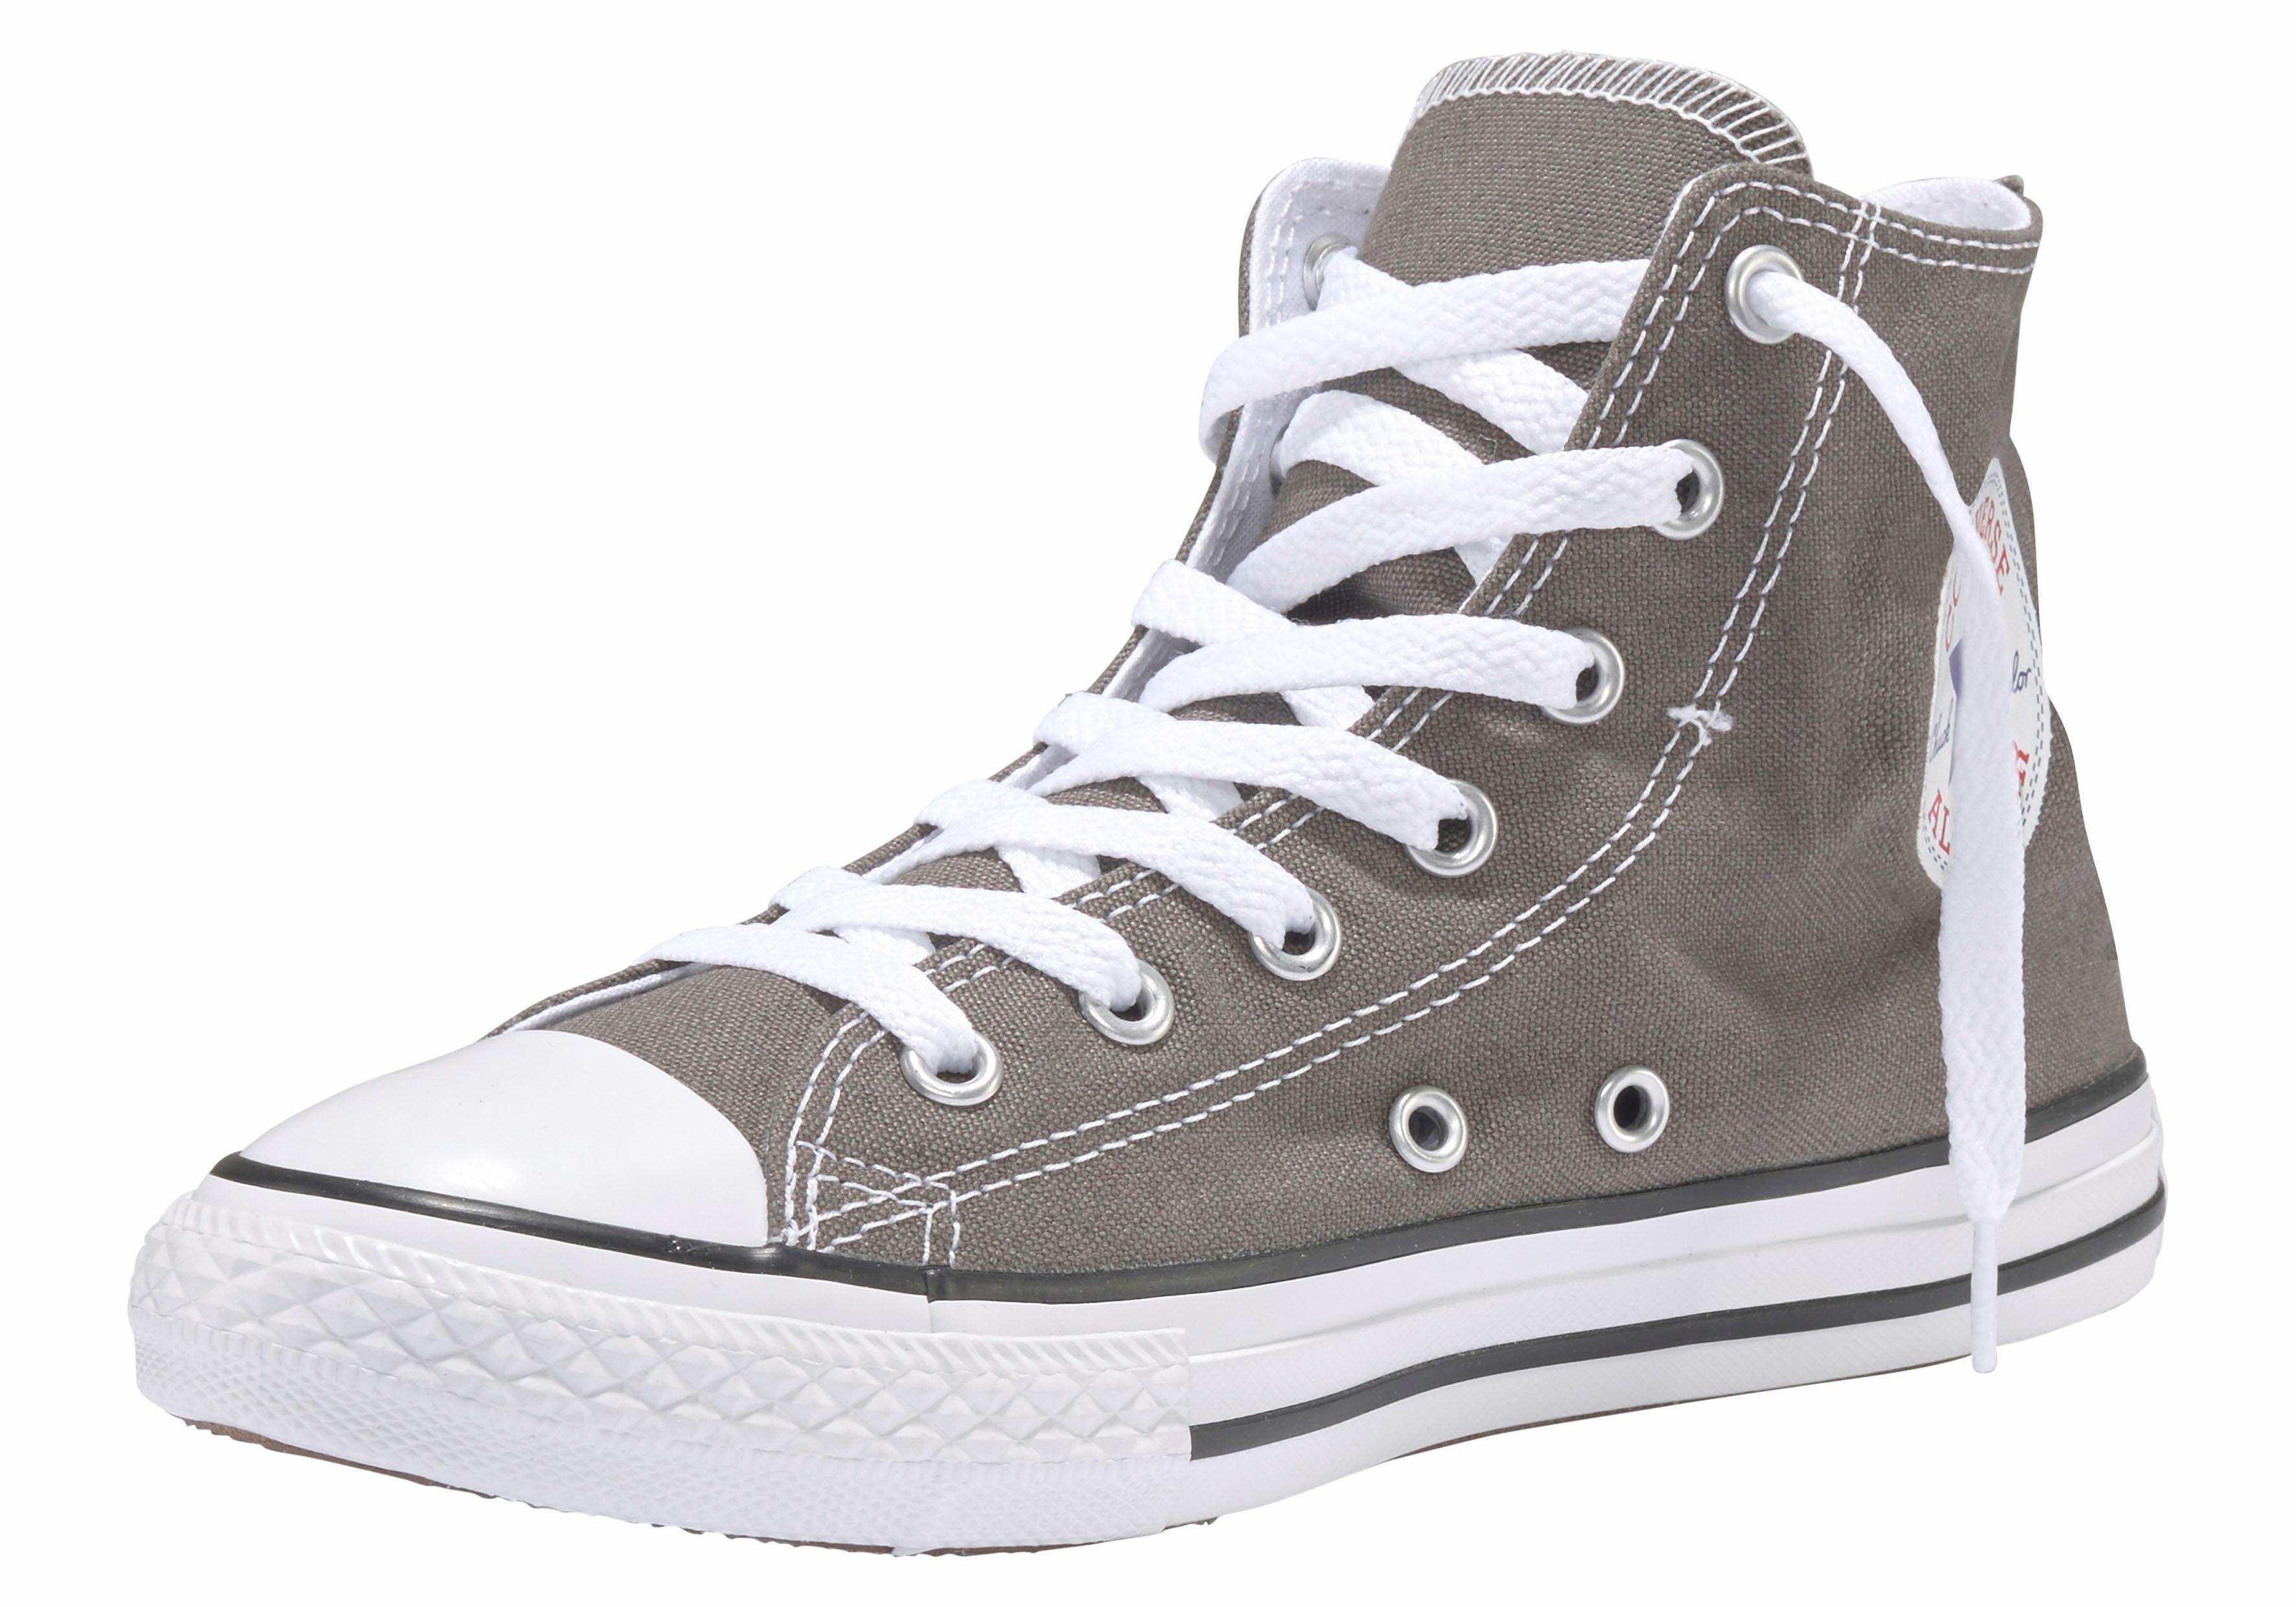 converse chucks slip on kinder